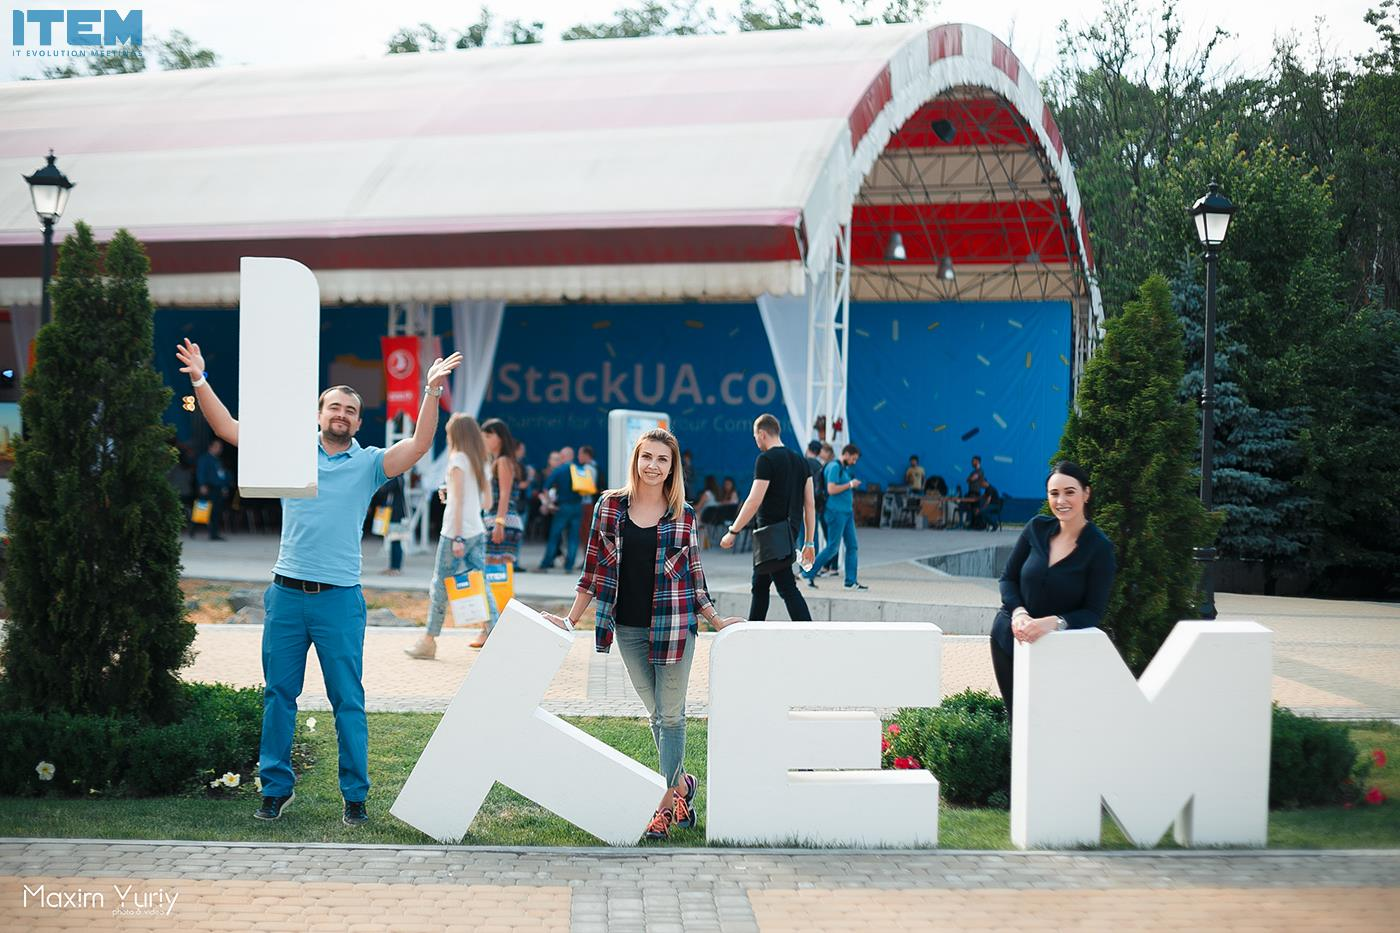 U berezni Kyїv pryjmatyme mižnarodnu ITEM-konferenciju